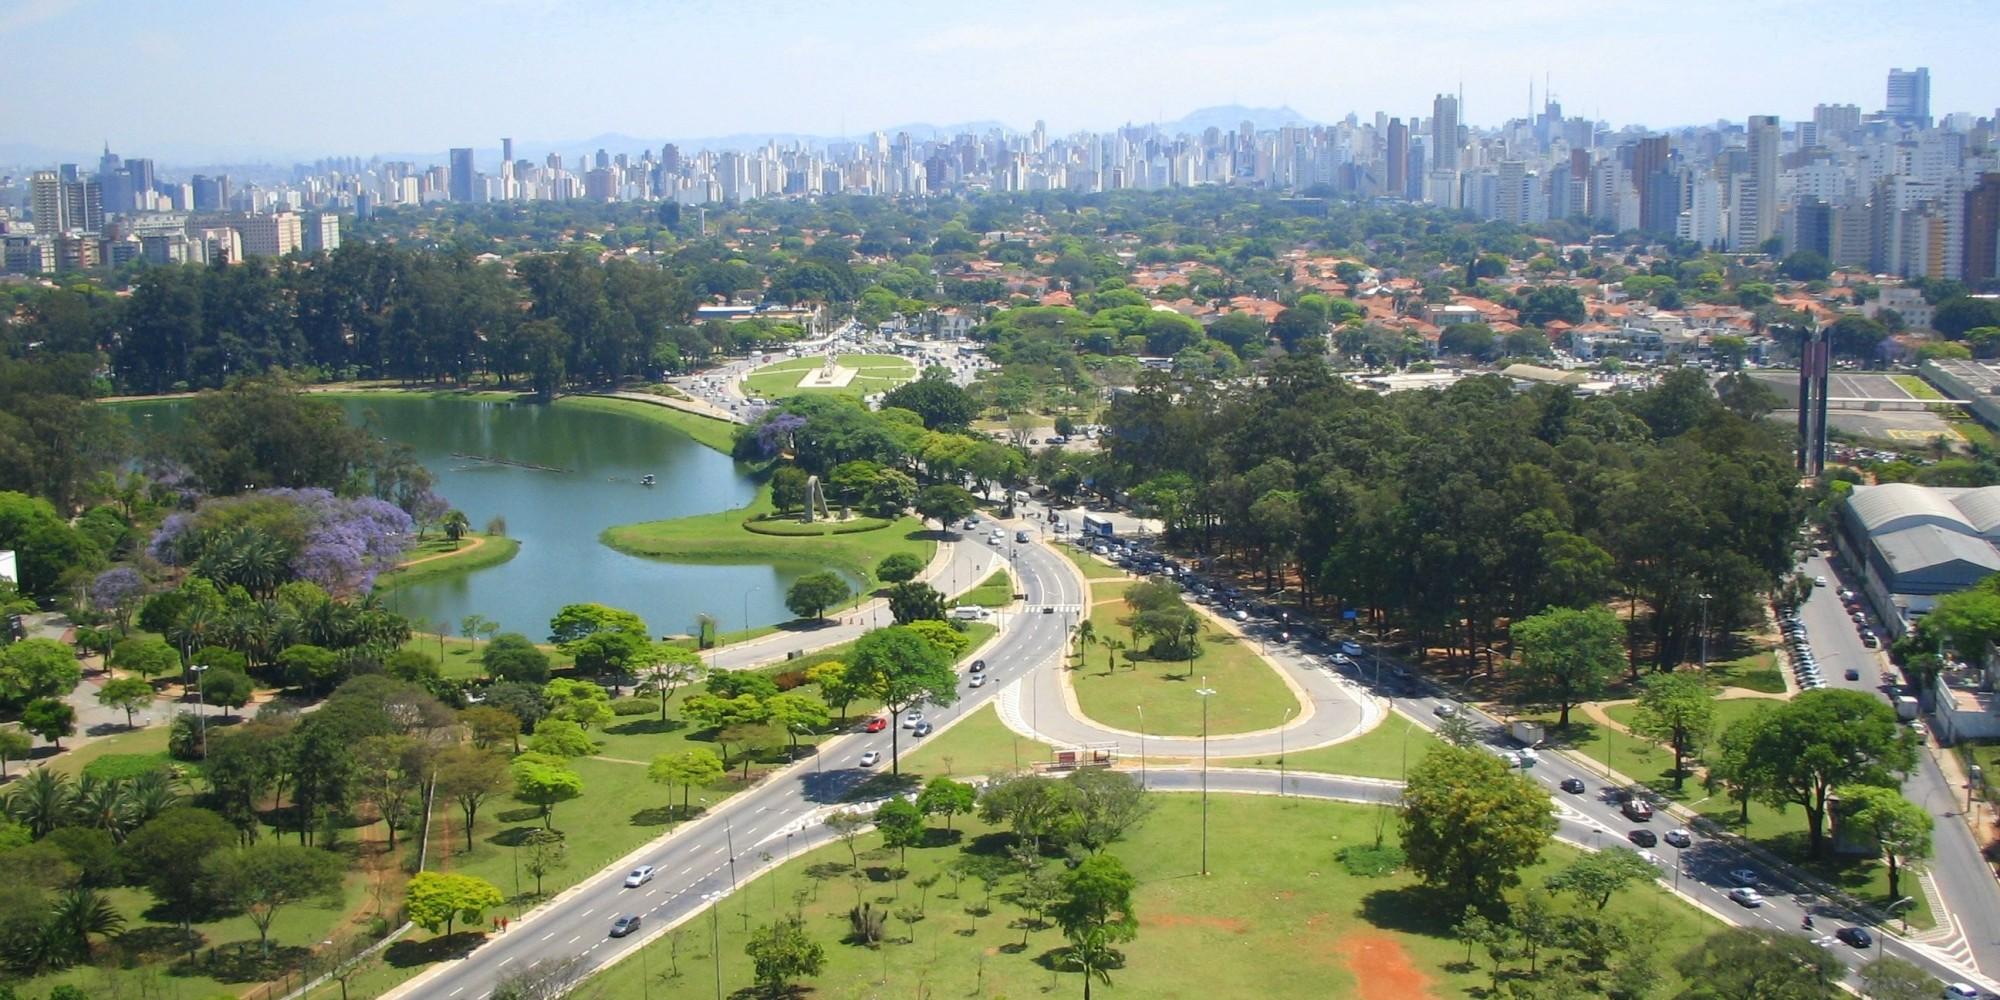 出典:http://www.brasilpost.com.br